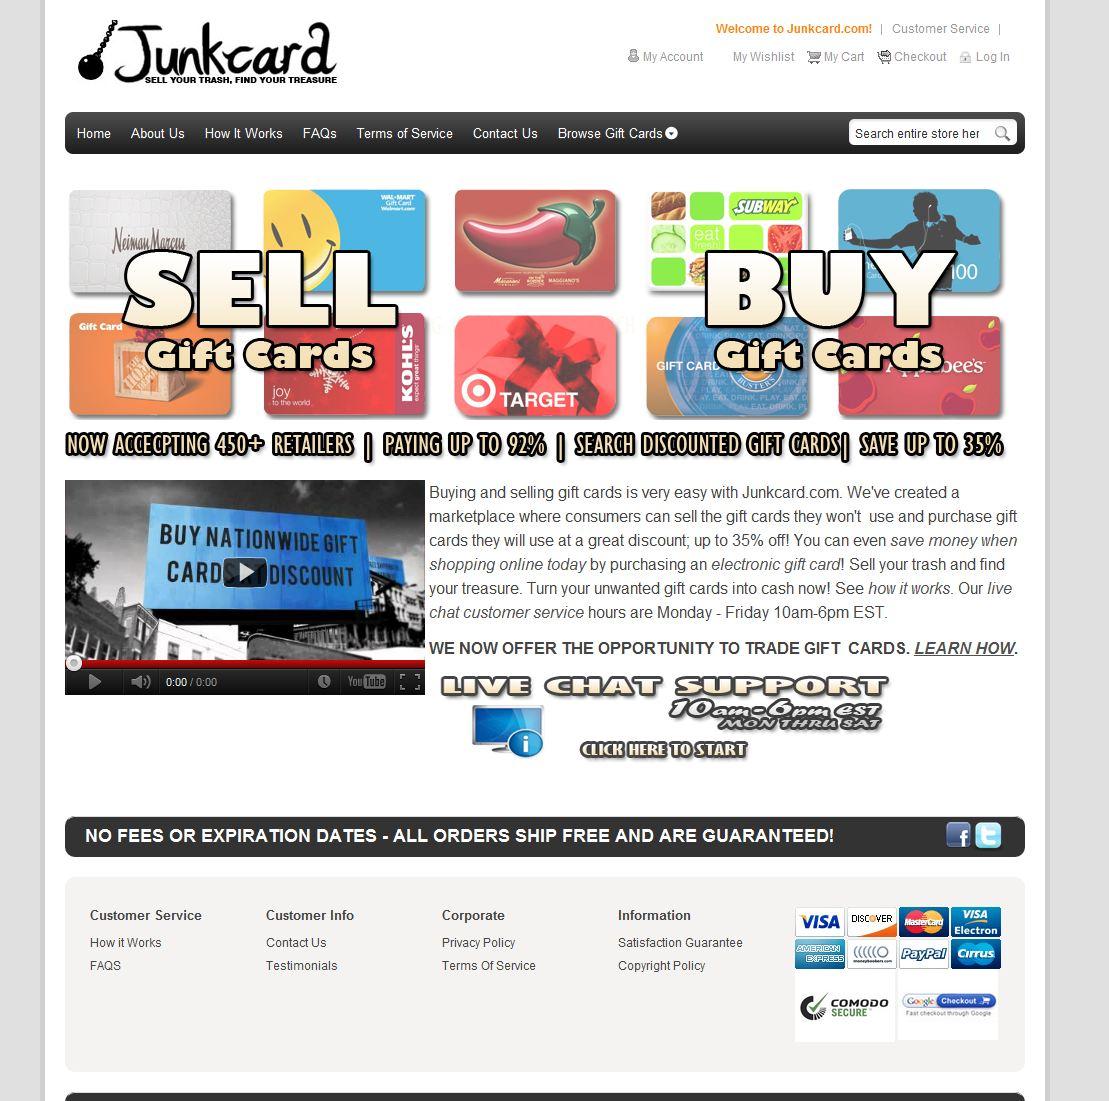 Junkcard.com